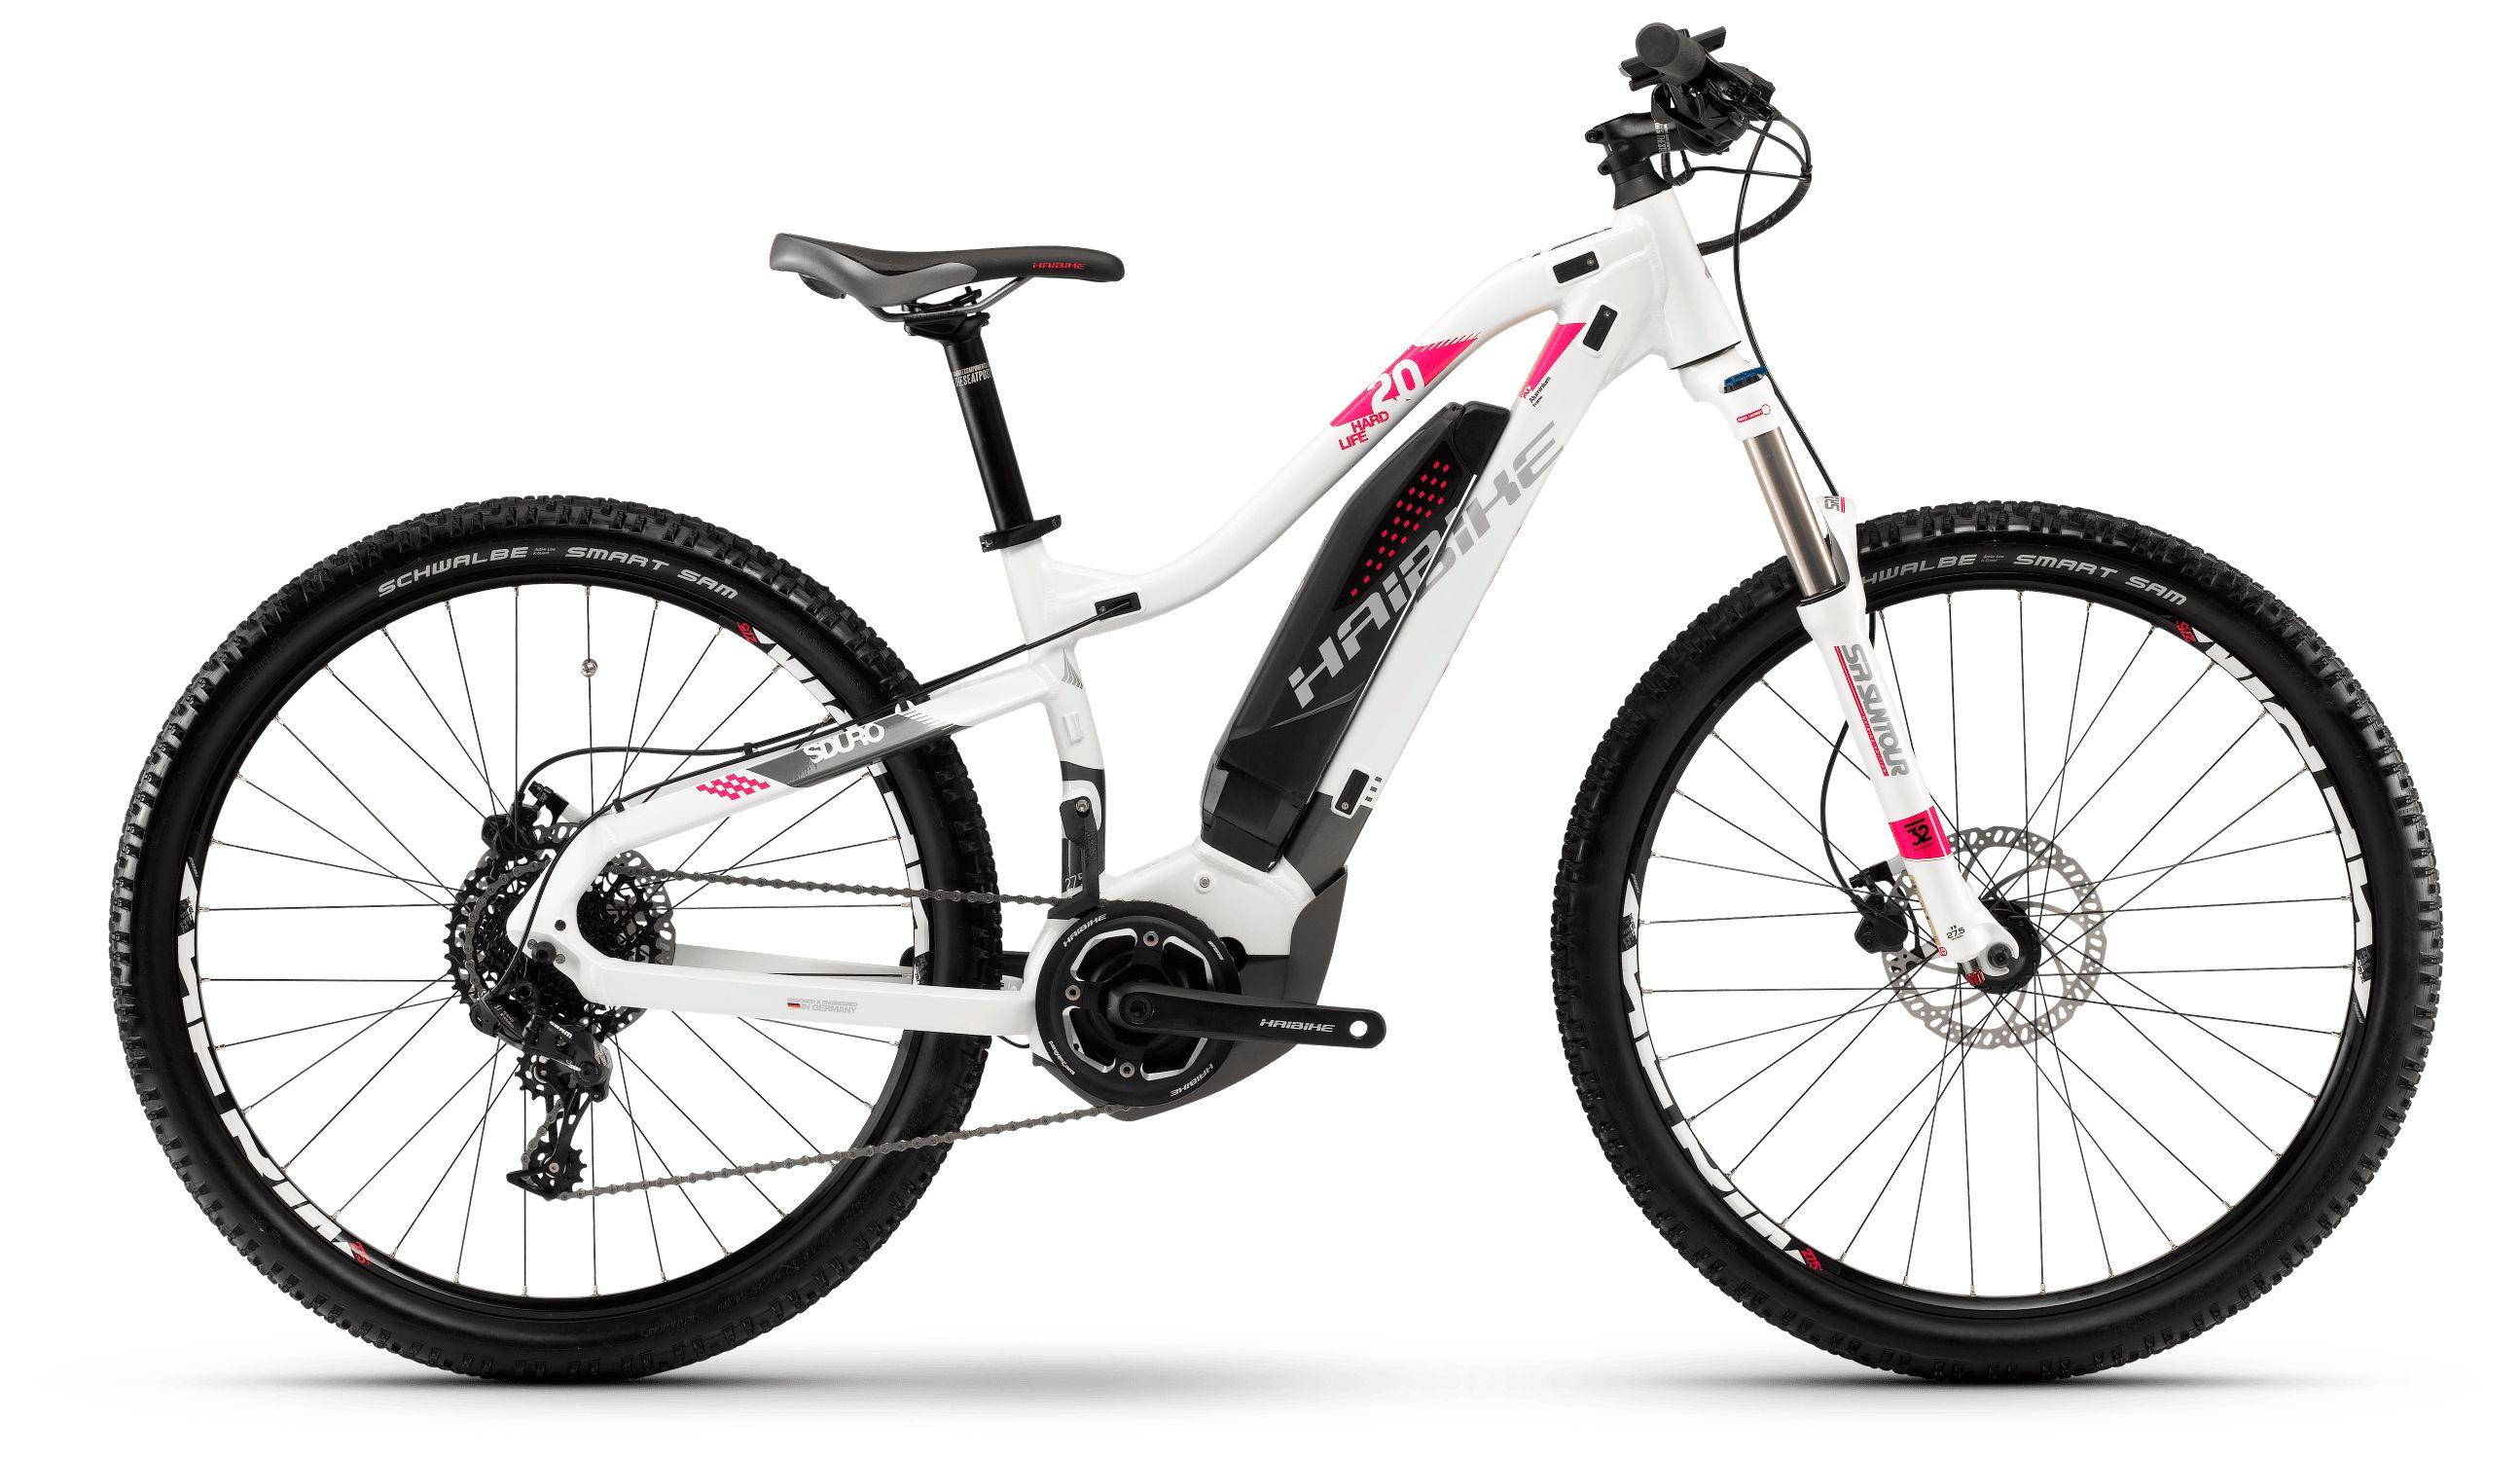 Велосипед Haibike Sduro HardLife 2.0 400Wh 11s NX 2018 велосипед haibike sduro trekking 4 0 women 2017